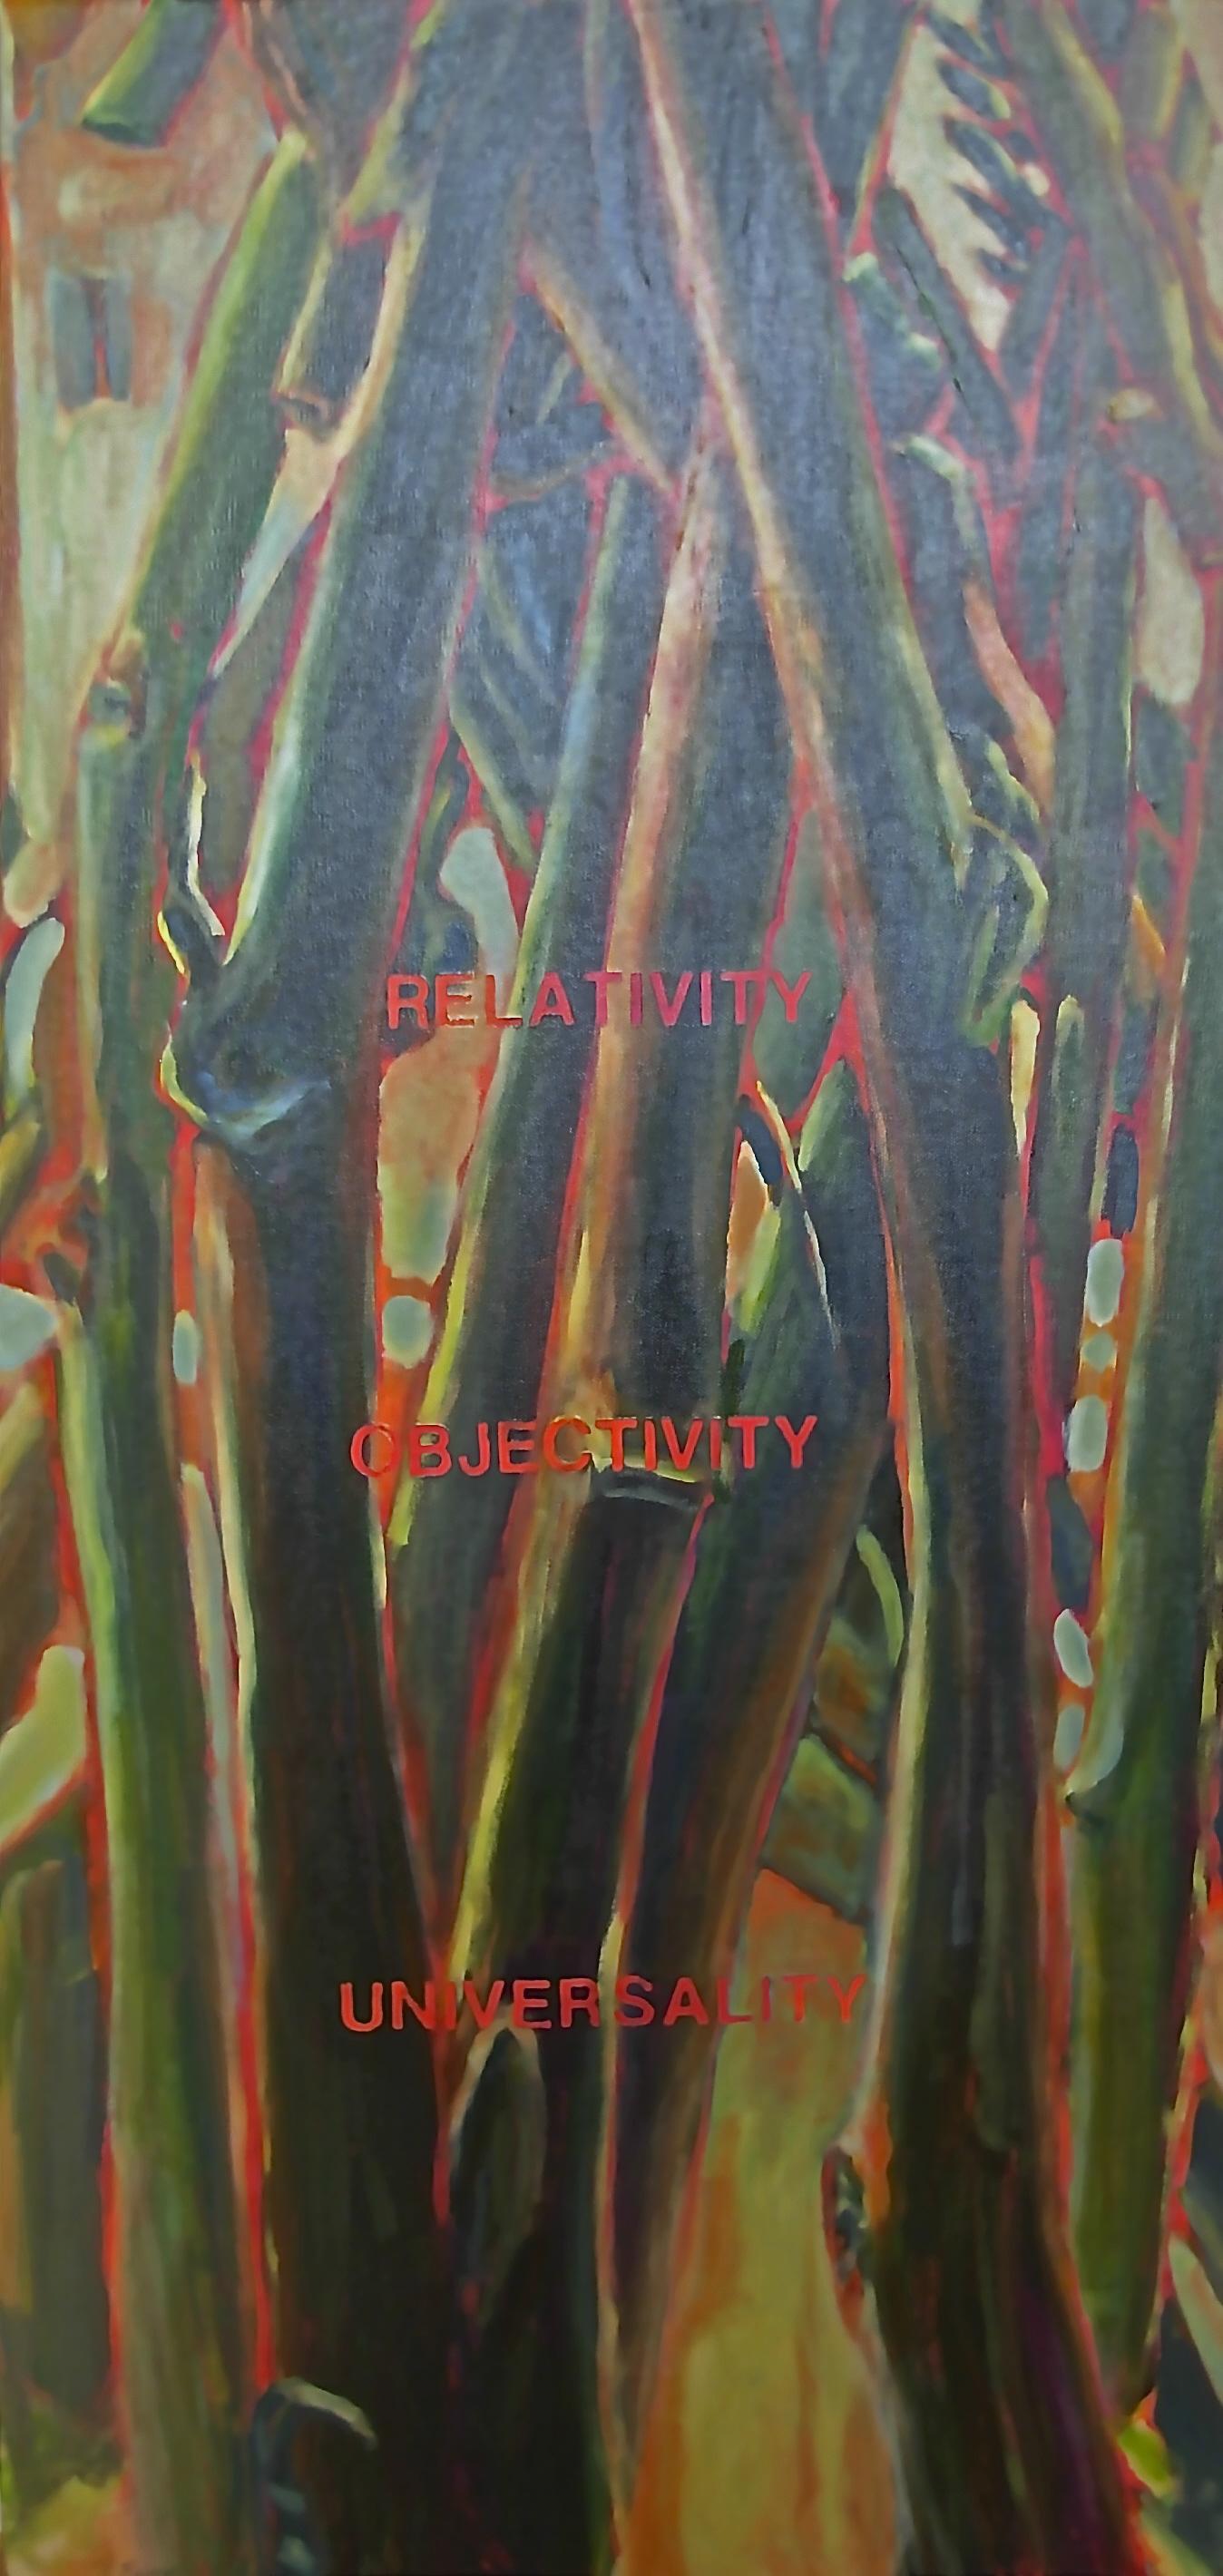 Relativity Objectivity Universality